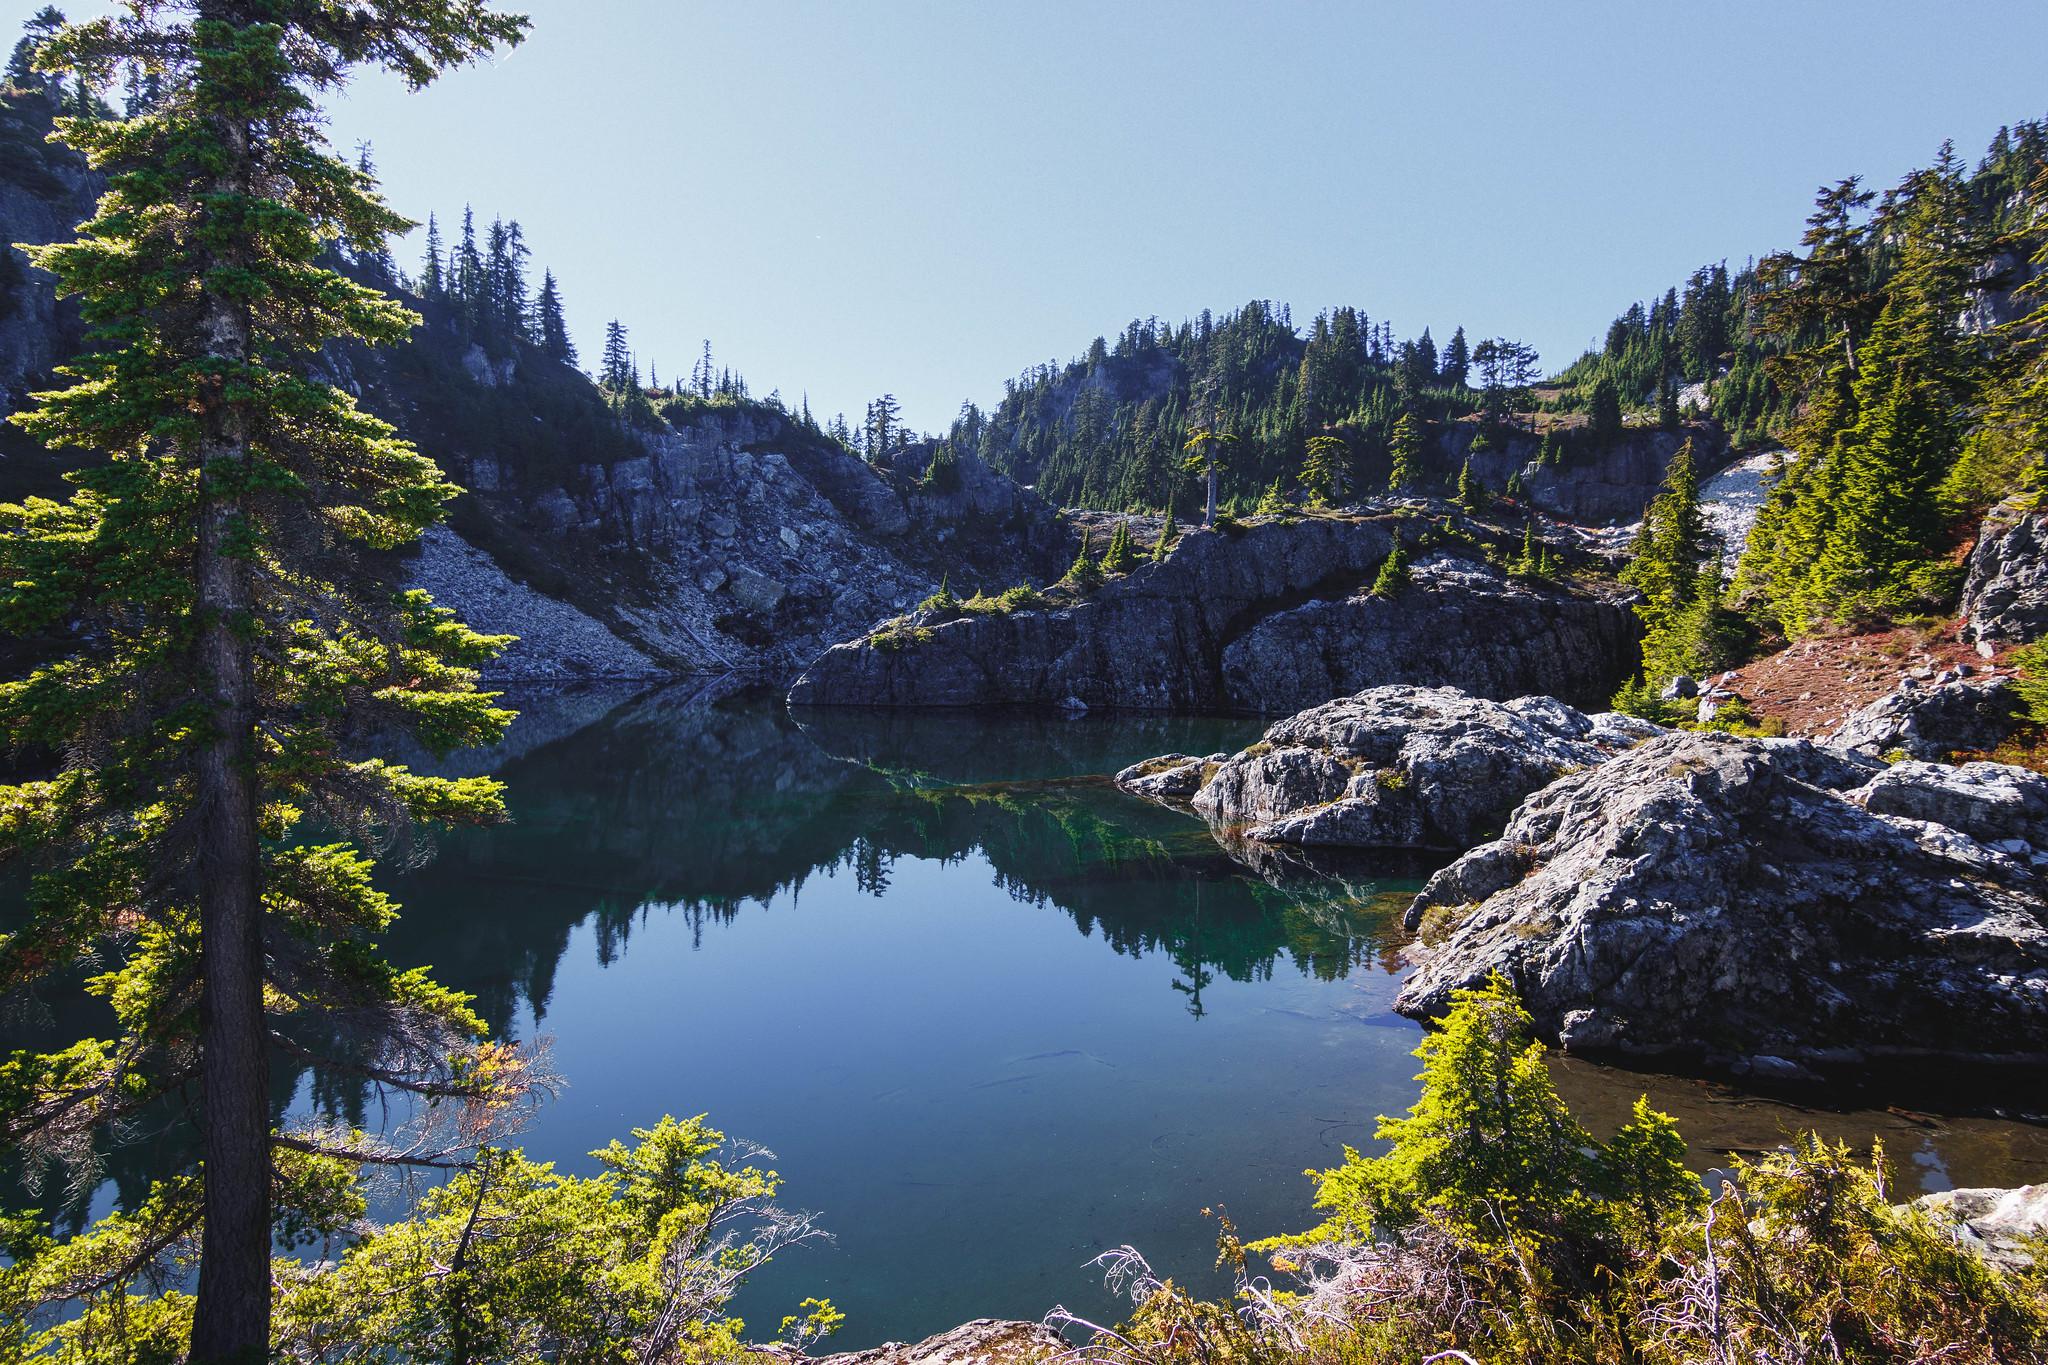 Boner Lake at last